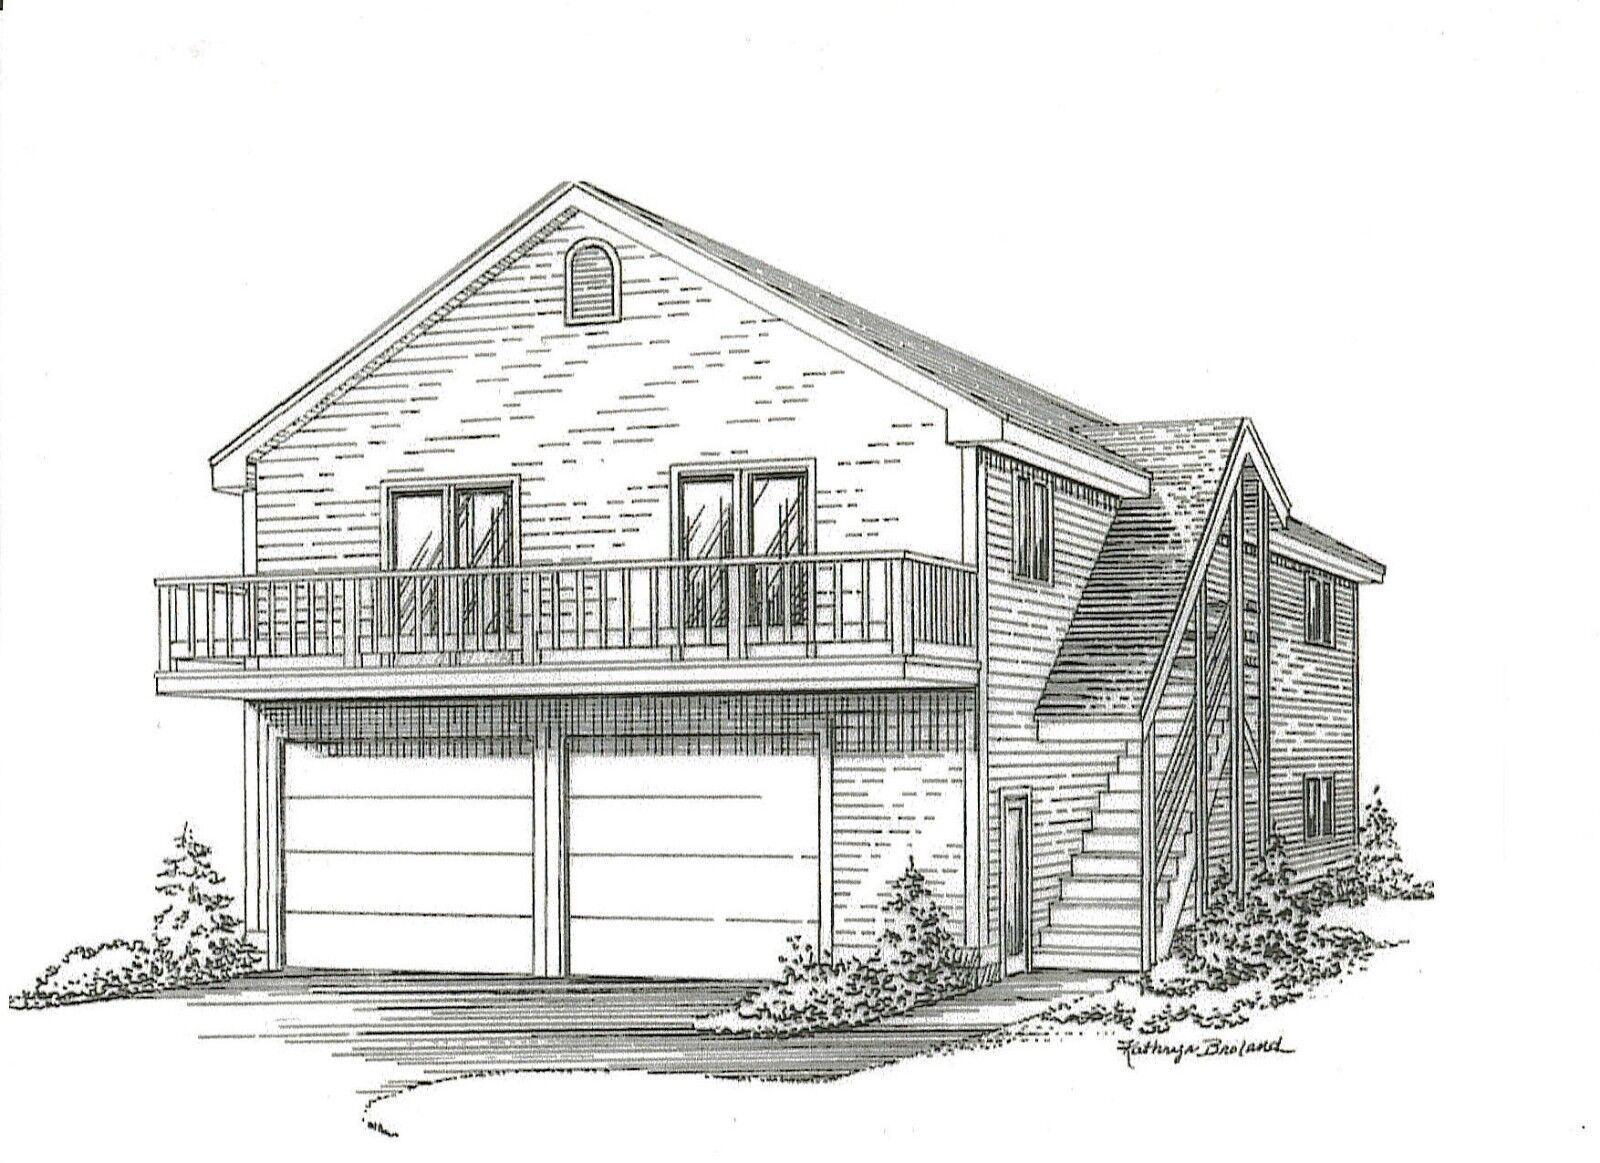 28 x 36 2 Car Garage Building Plans w  2nd Floor Open Loft Area & Exterior Stair